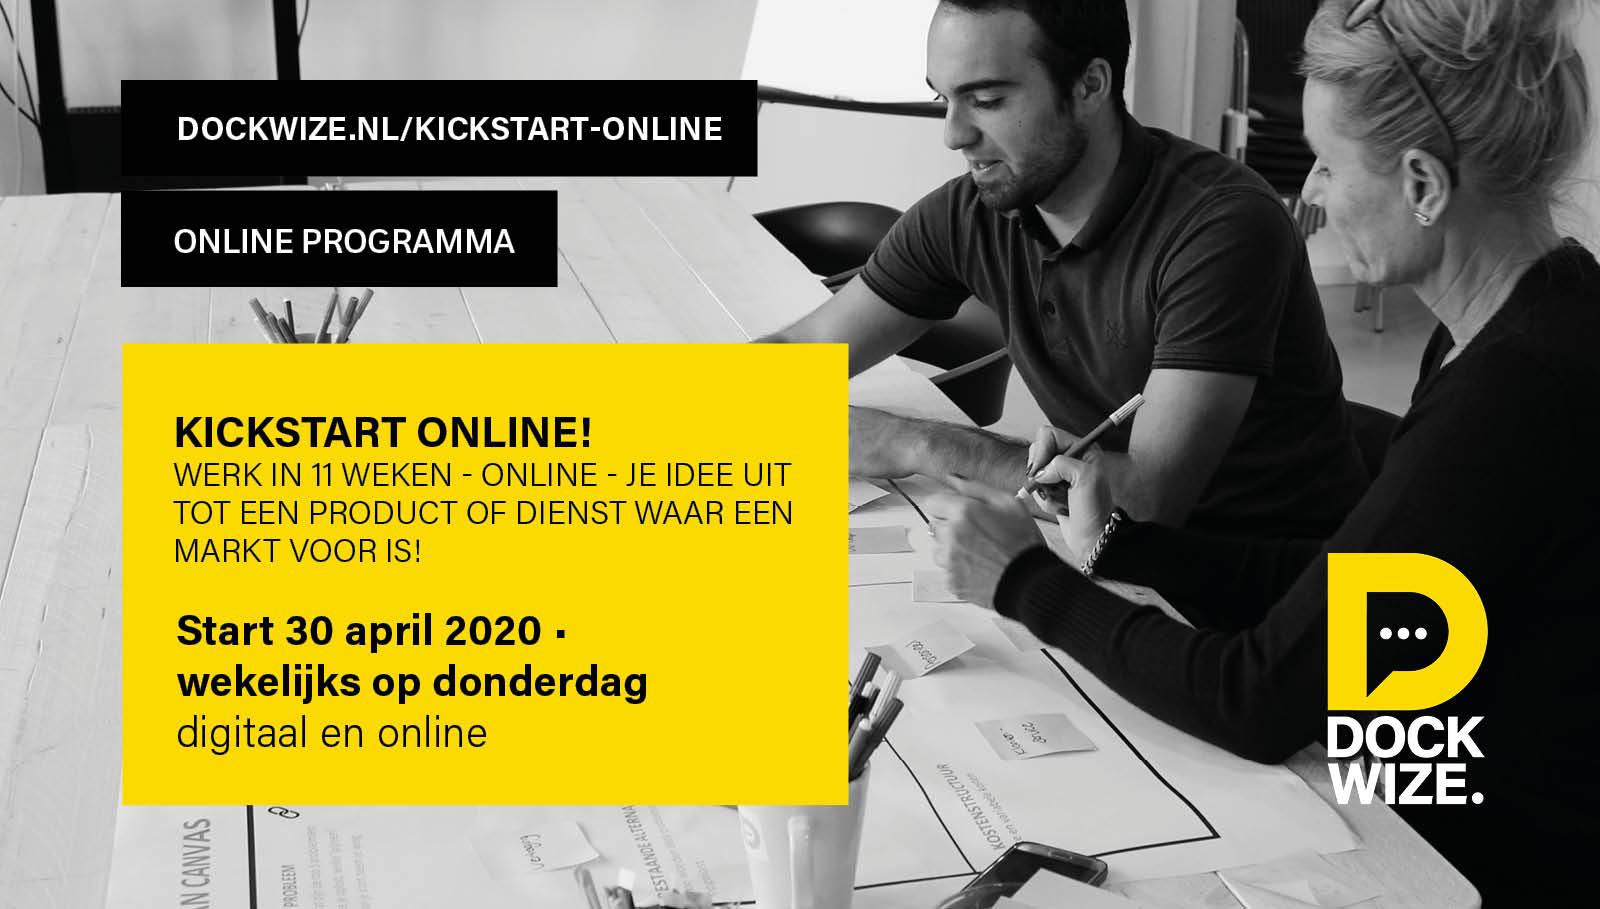 kickstartprogramma online 30 april 2020